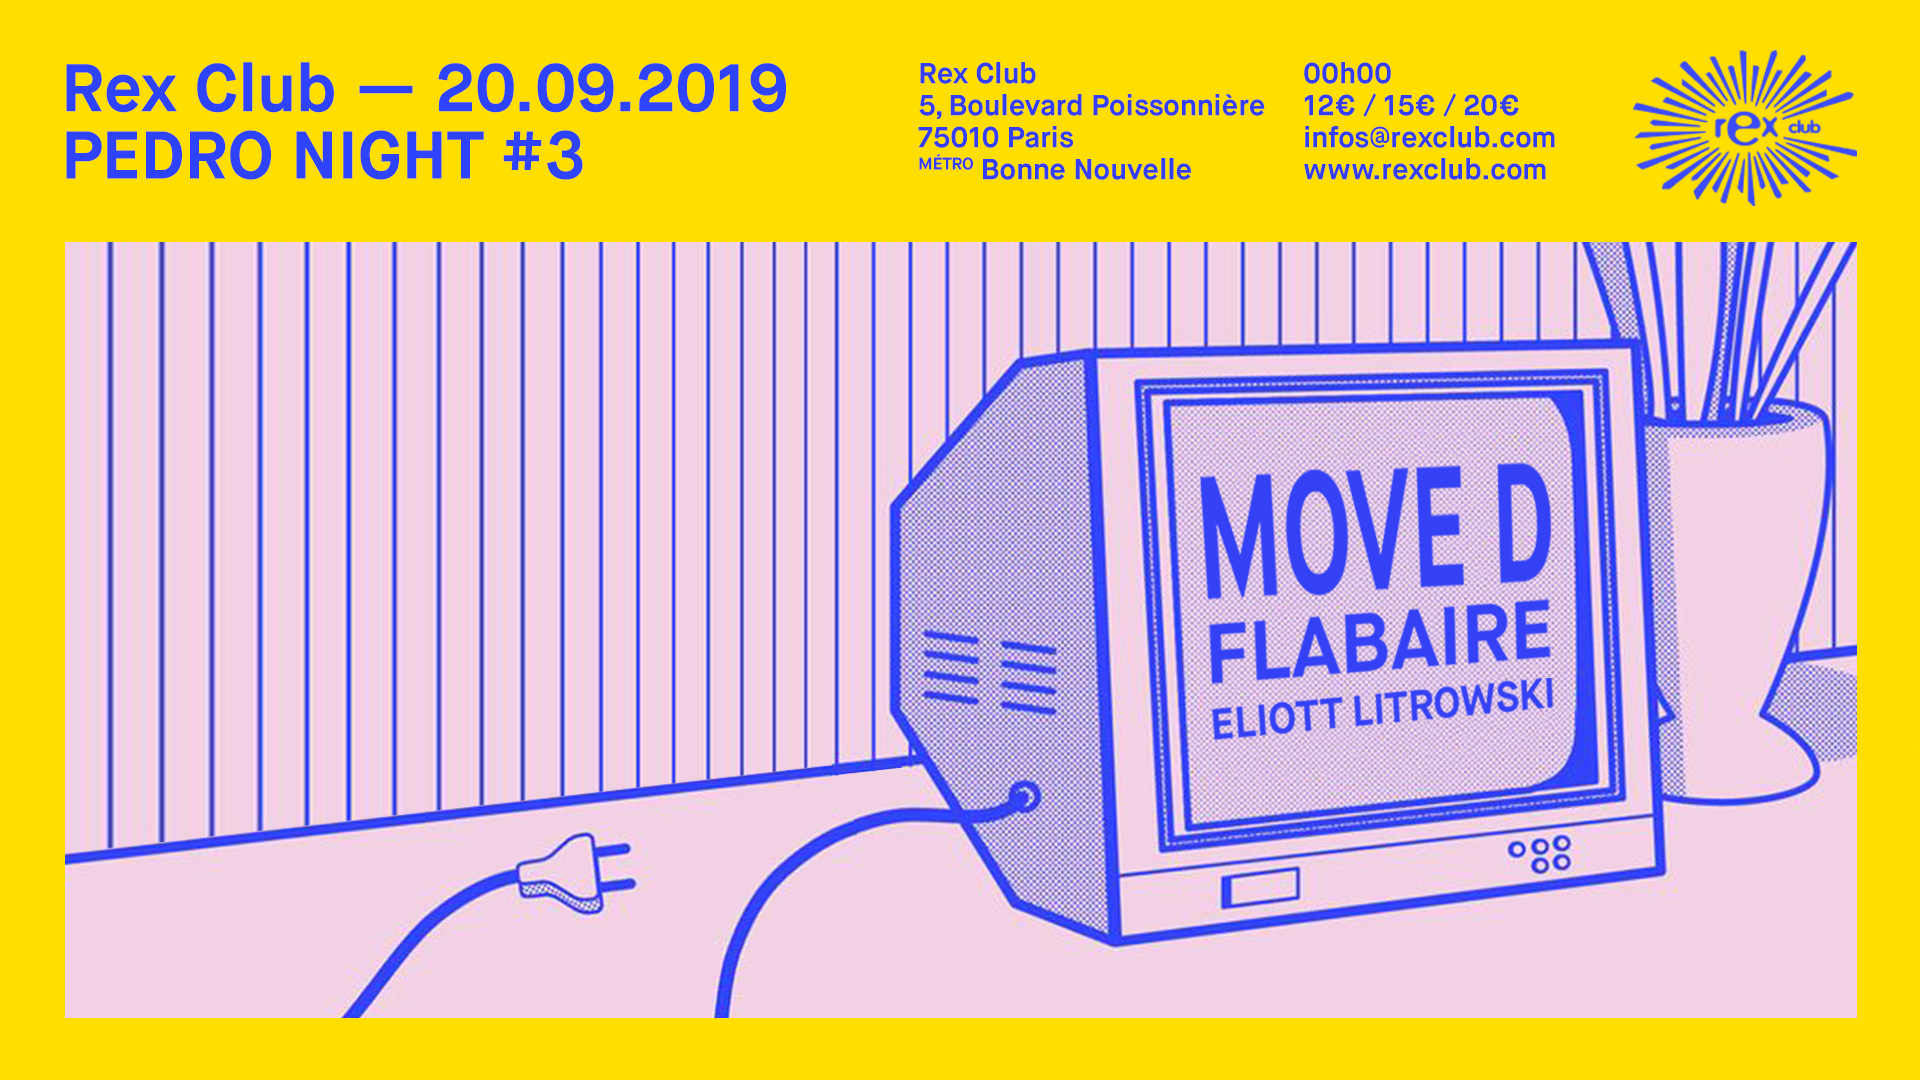 Pedro Night #3: Move D, Flabaire, Eliott Litrowski